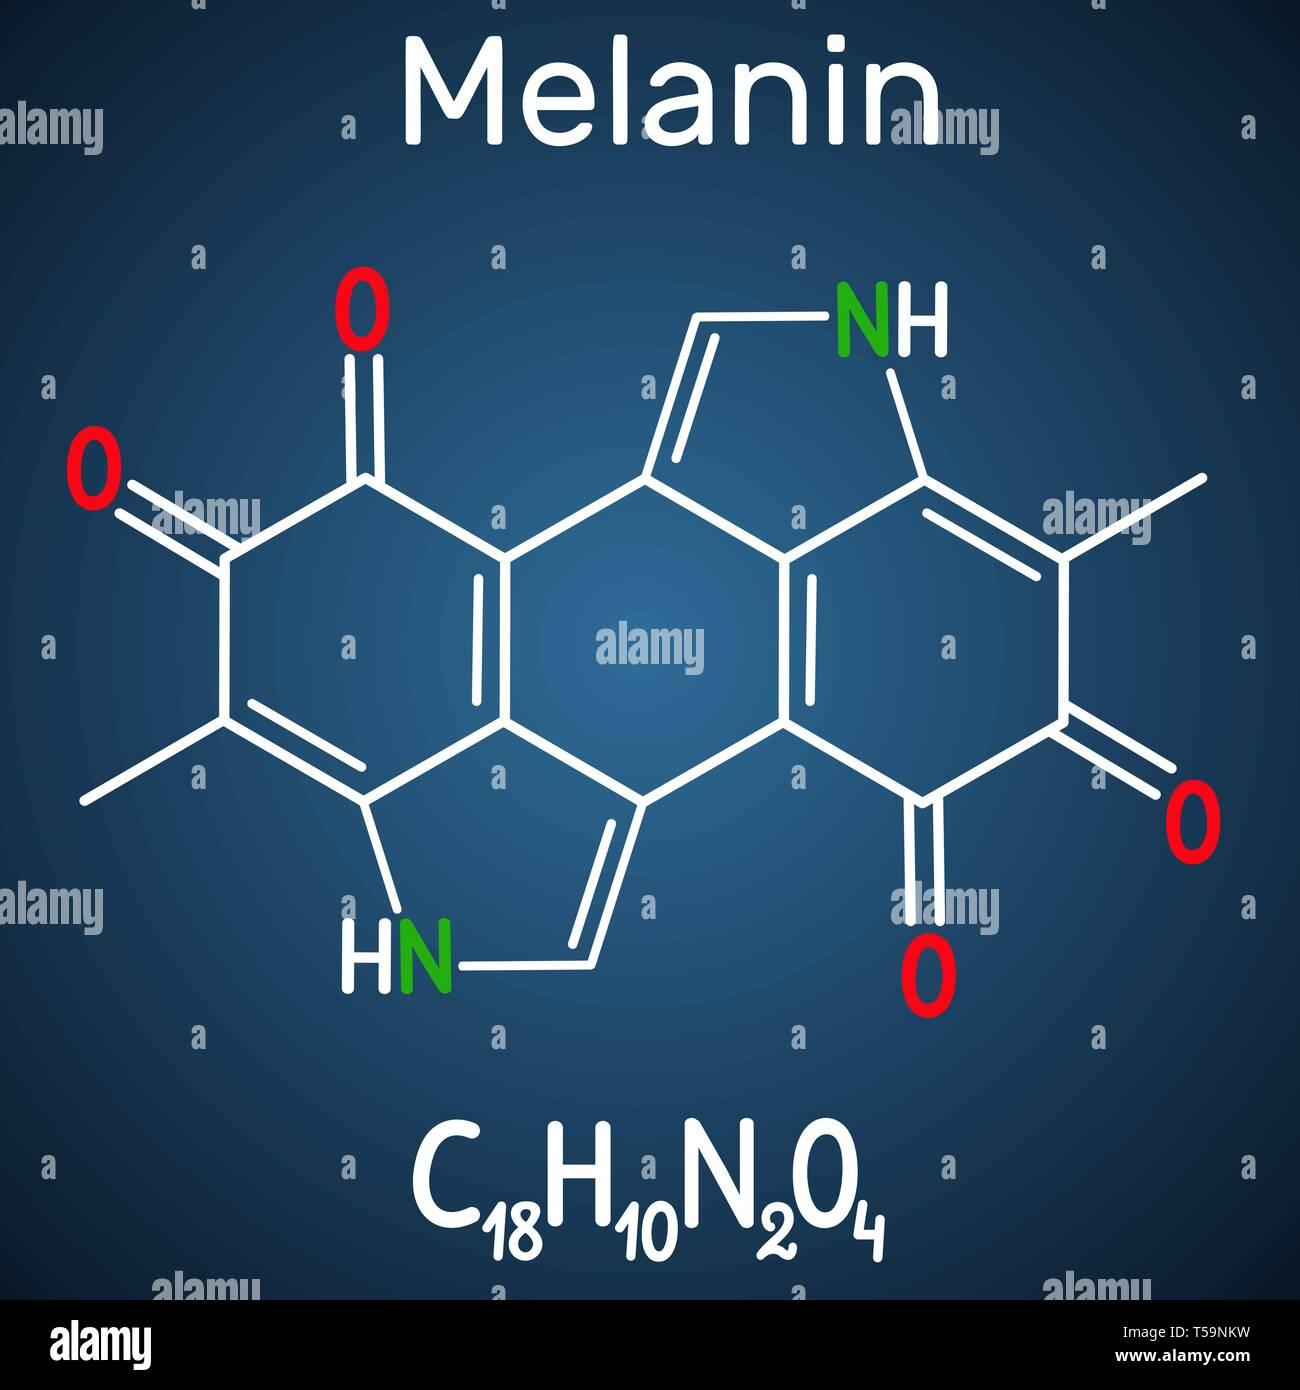 Melanin  molecule. Structural chemical formula and molecule model on the dark blue background. Vector illustration Stock Vector